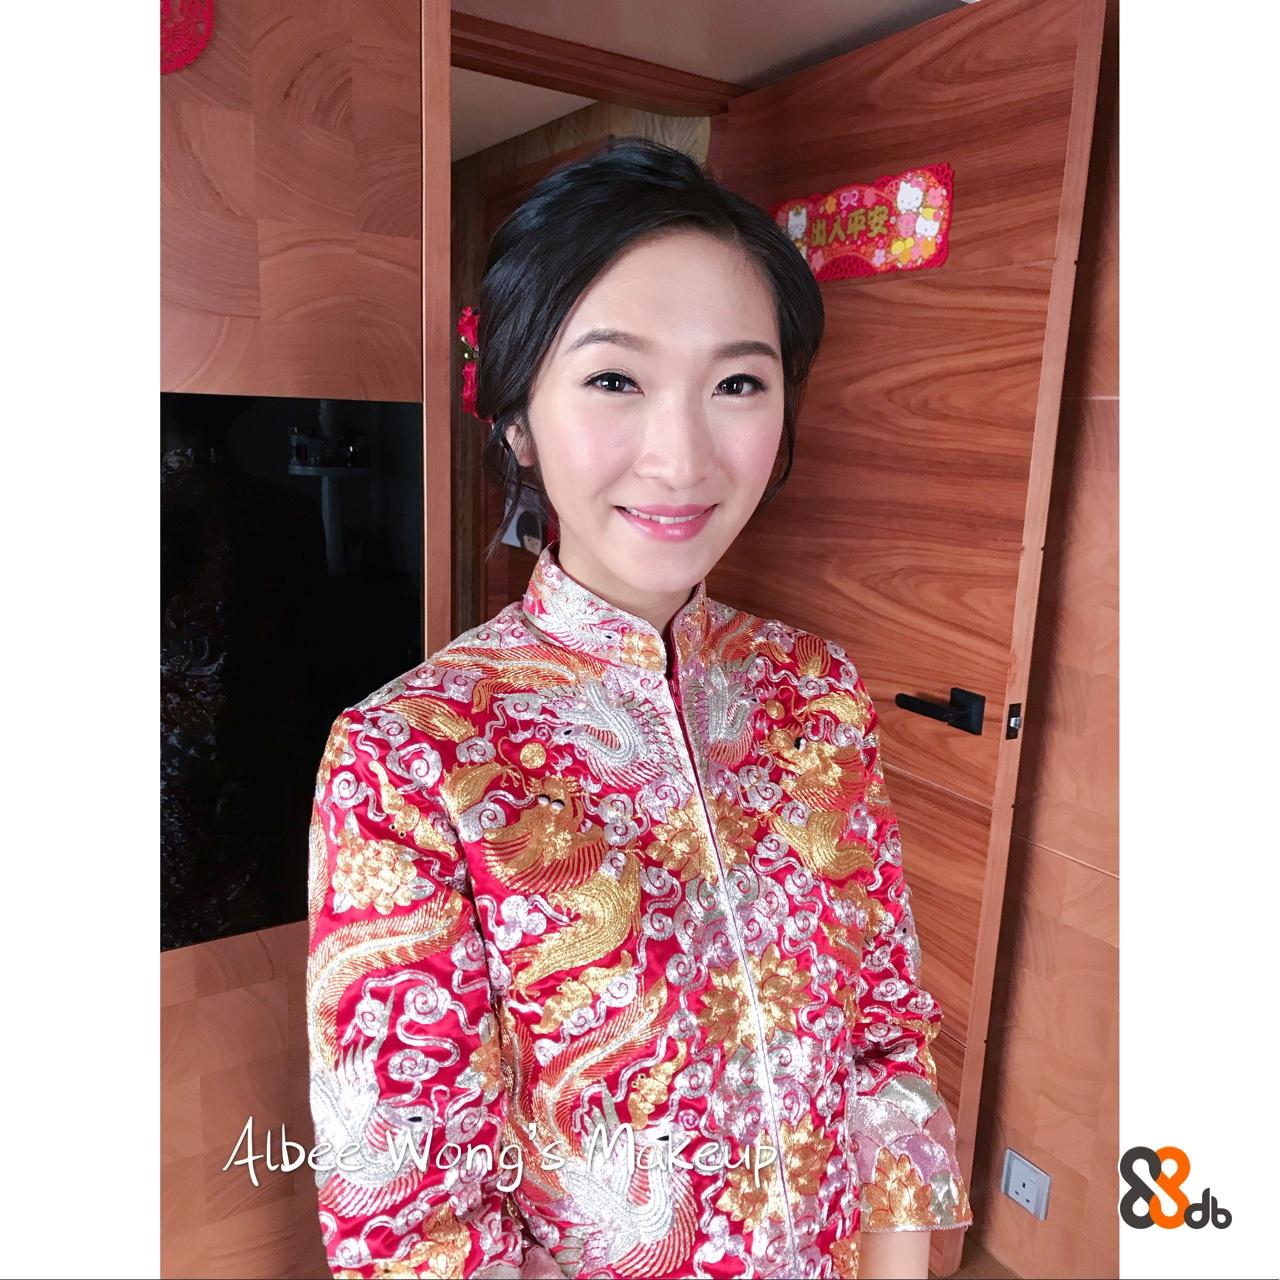 4lb g  Kimono,Clothing,Beauty,Costume,Textile